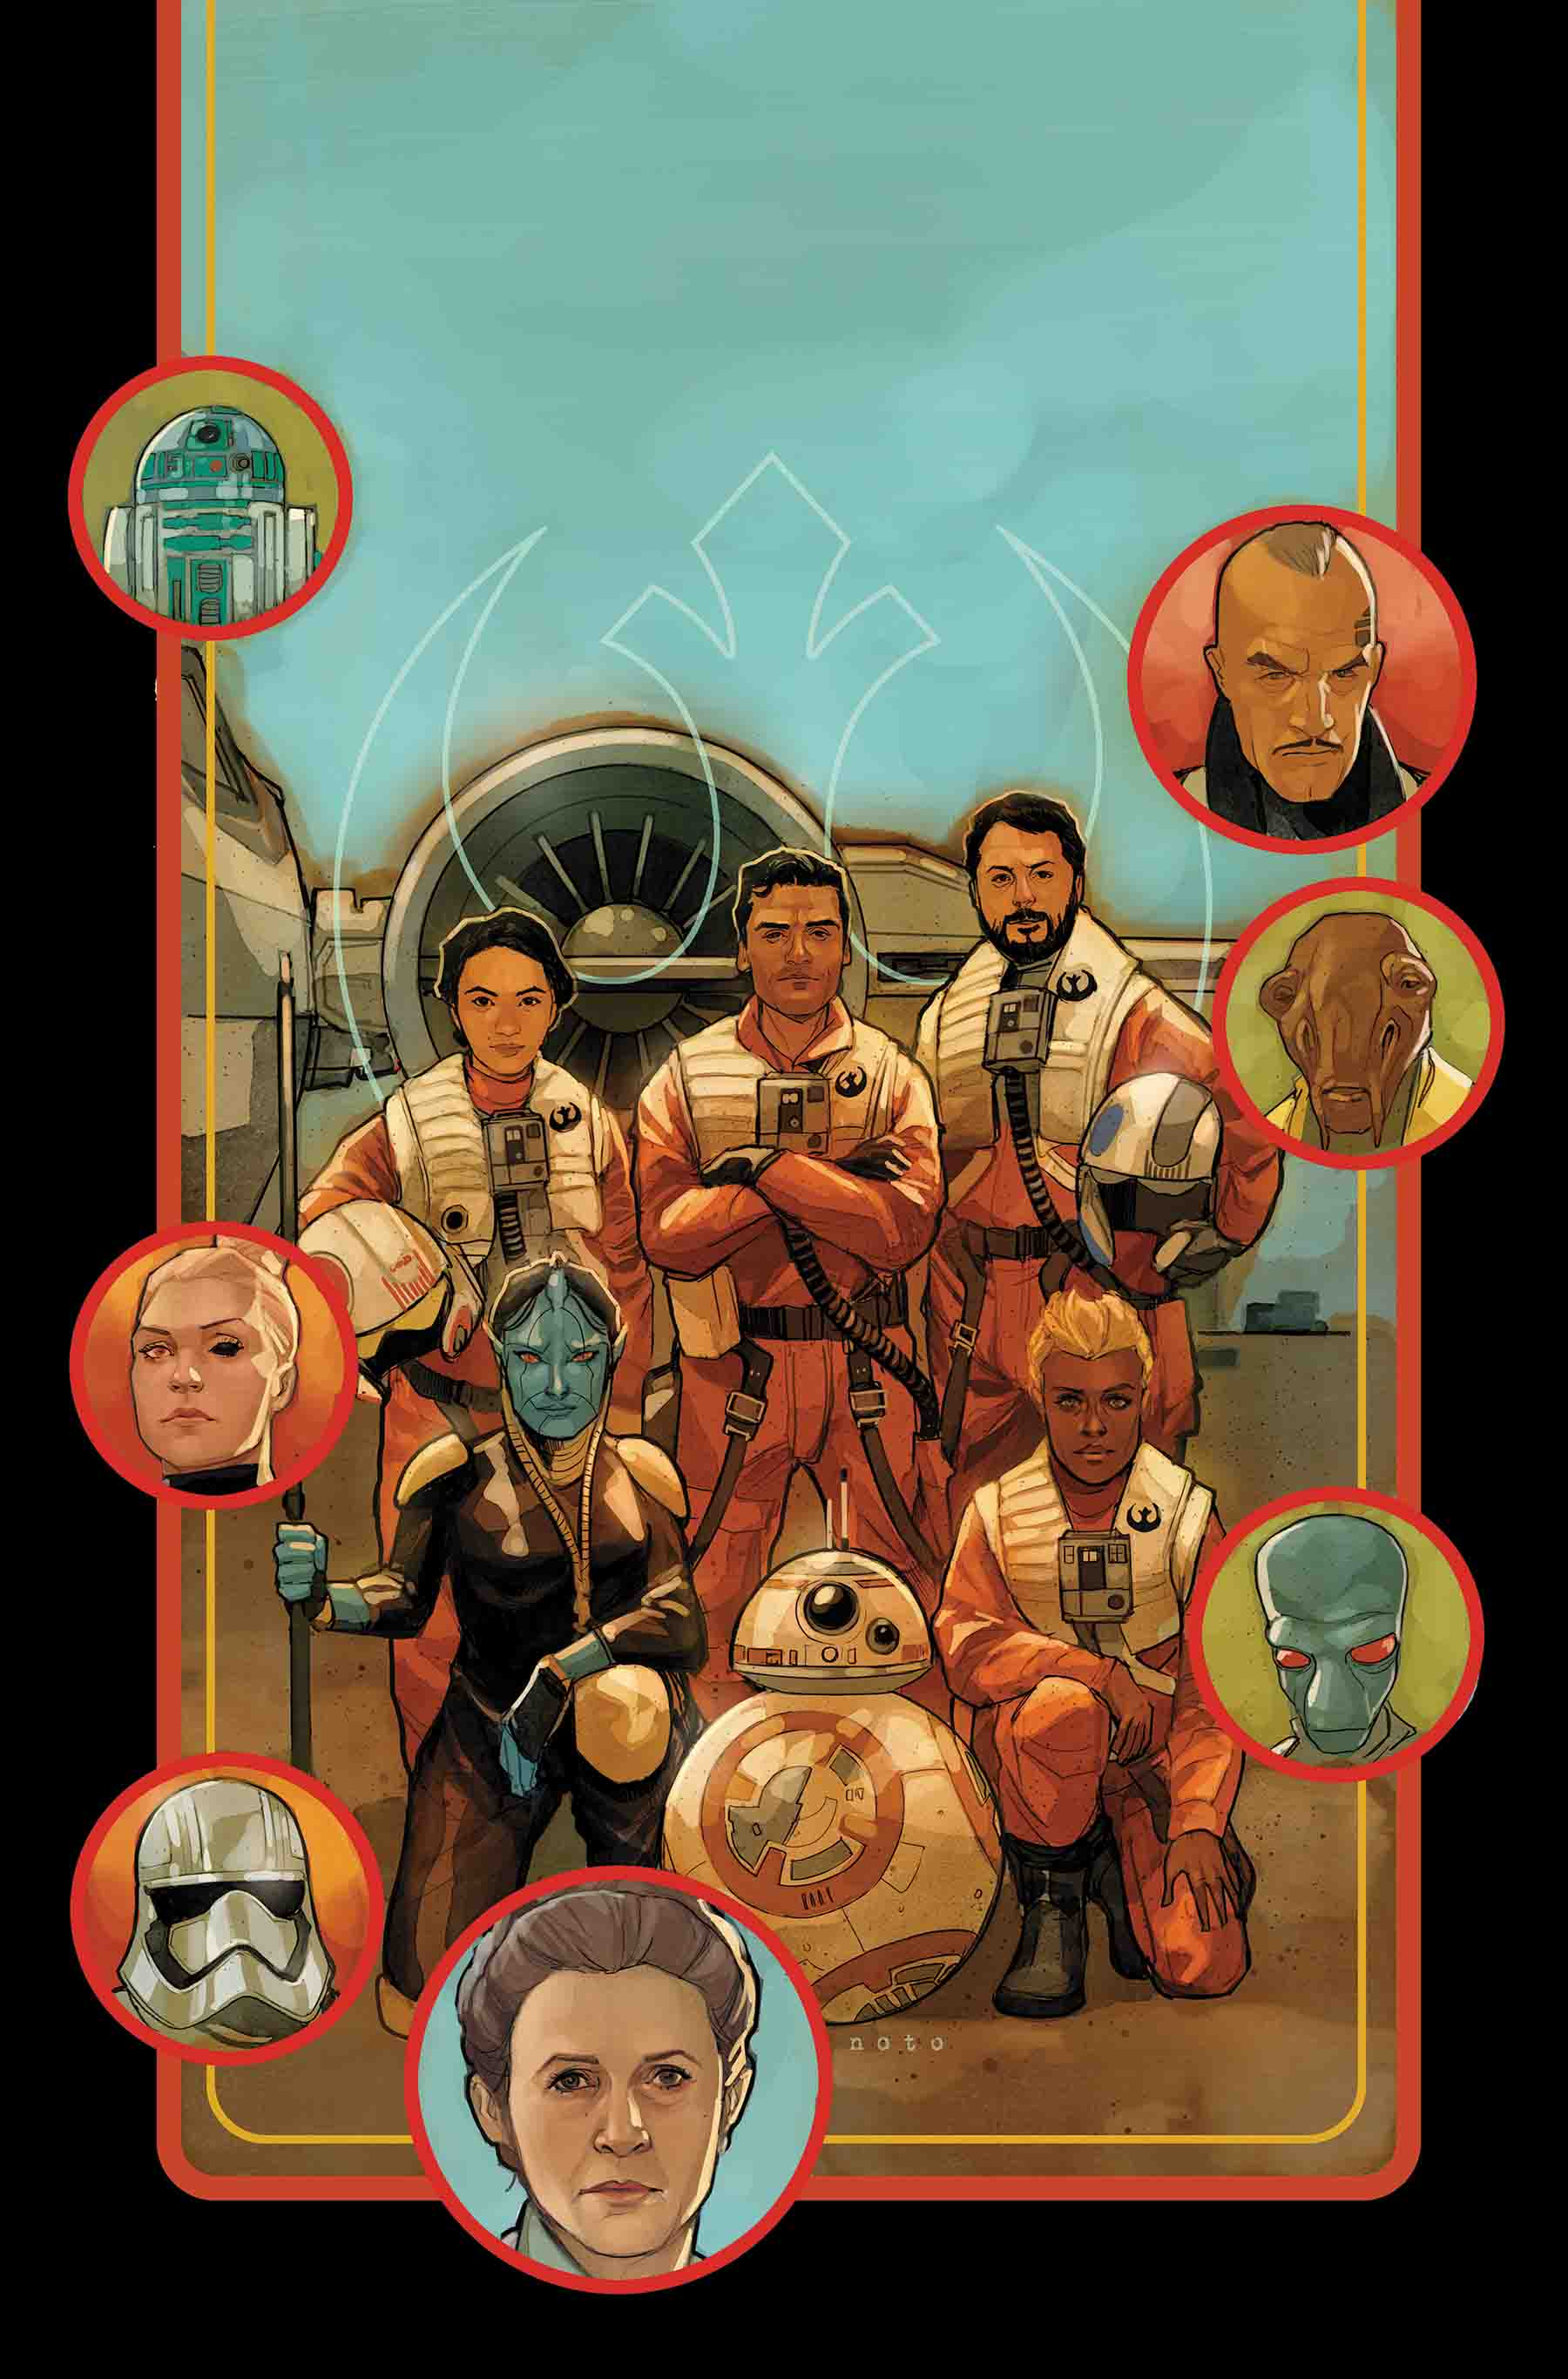 Star Wars Destiny #29 Poe Dameron Awakening Legendary